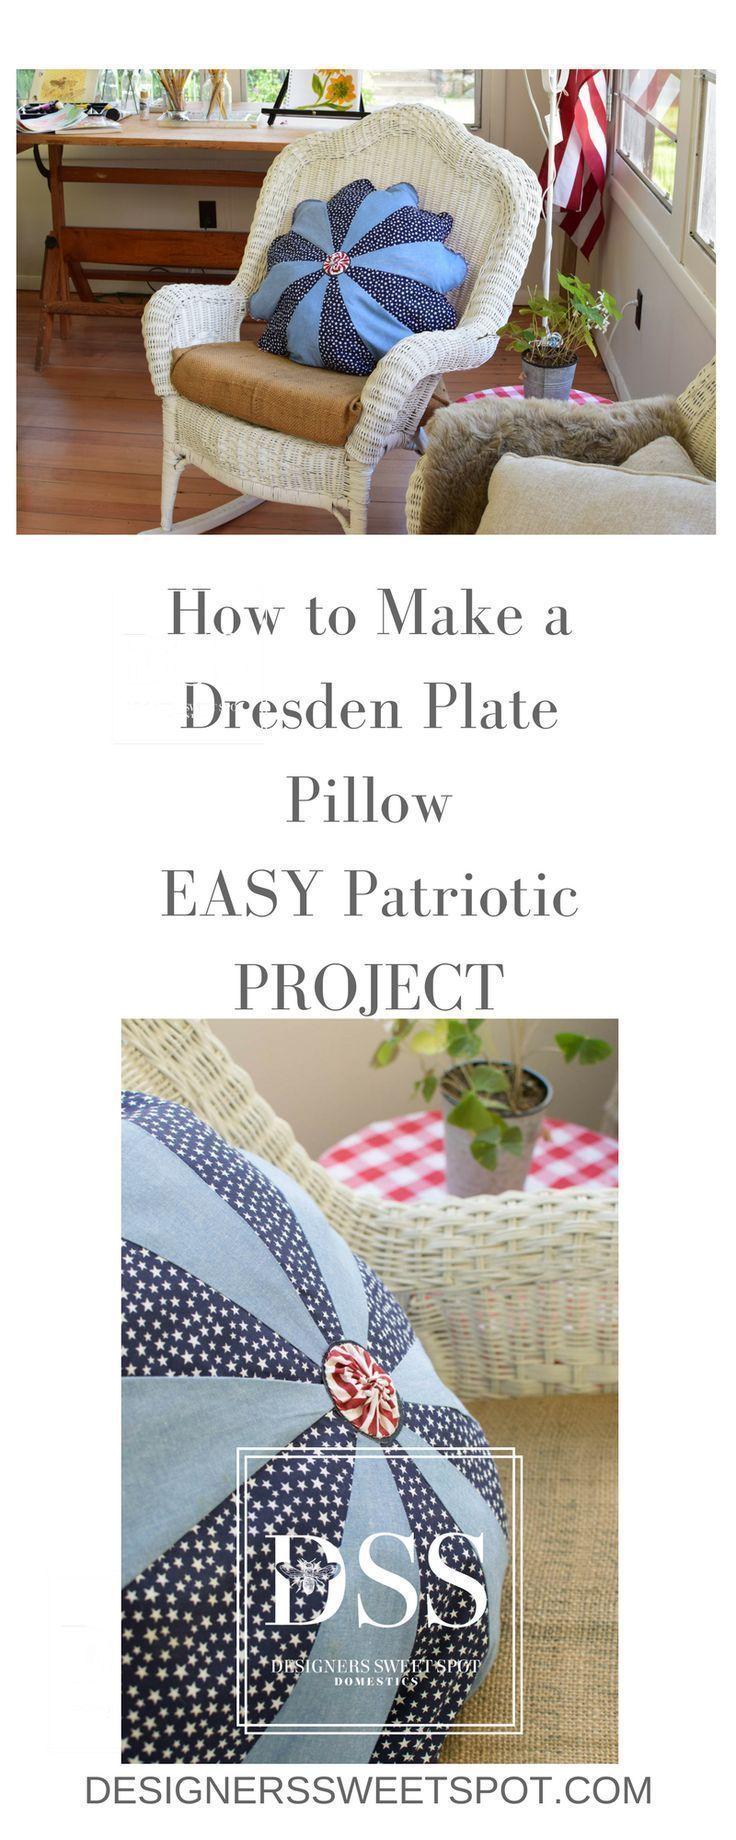 How to Make a Dresden Plate Pillow with Patriotic Fabrics|Designers Sweet Spot|www.designerssweetspot.com